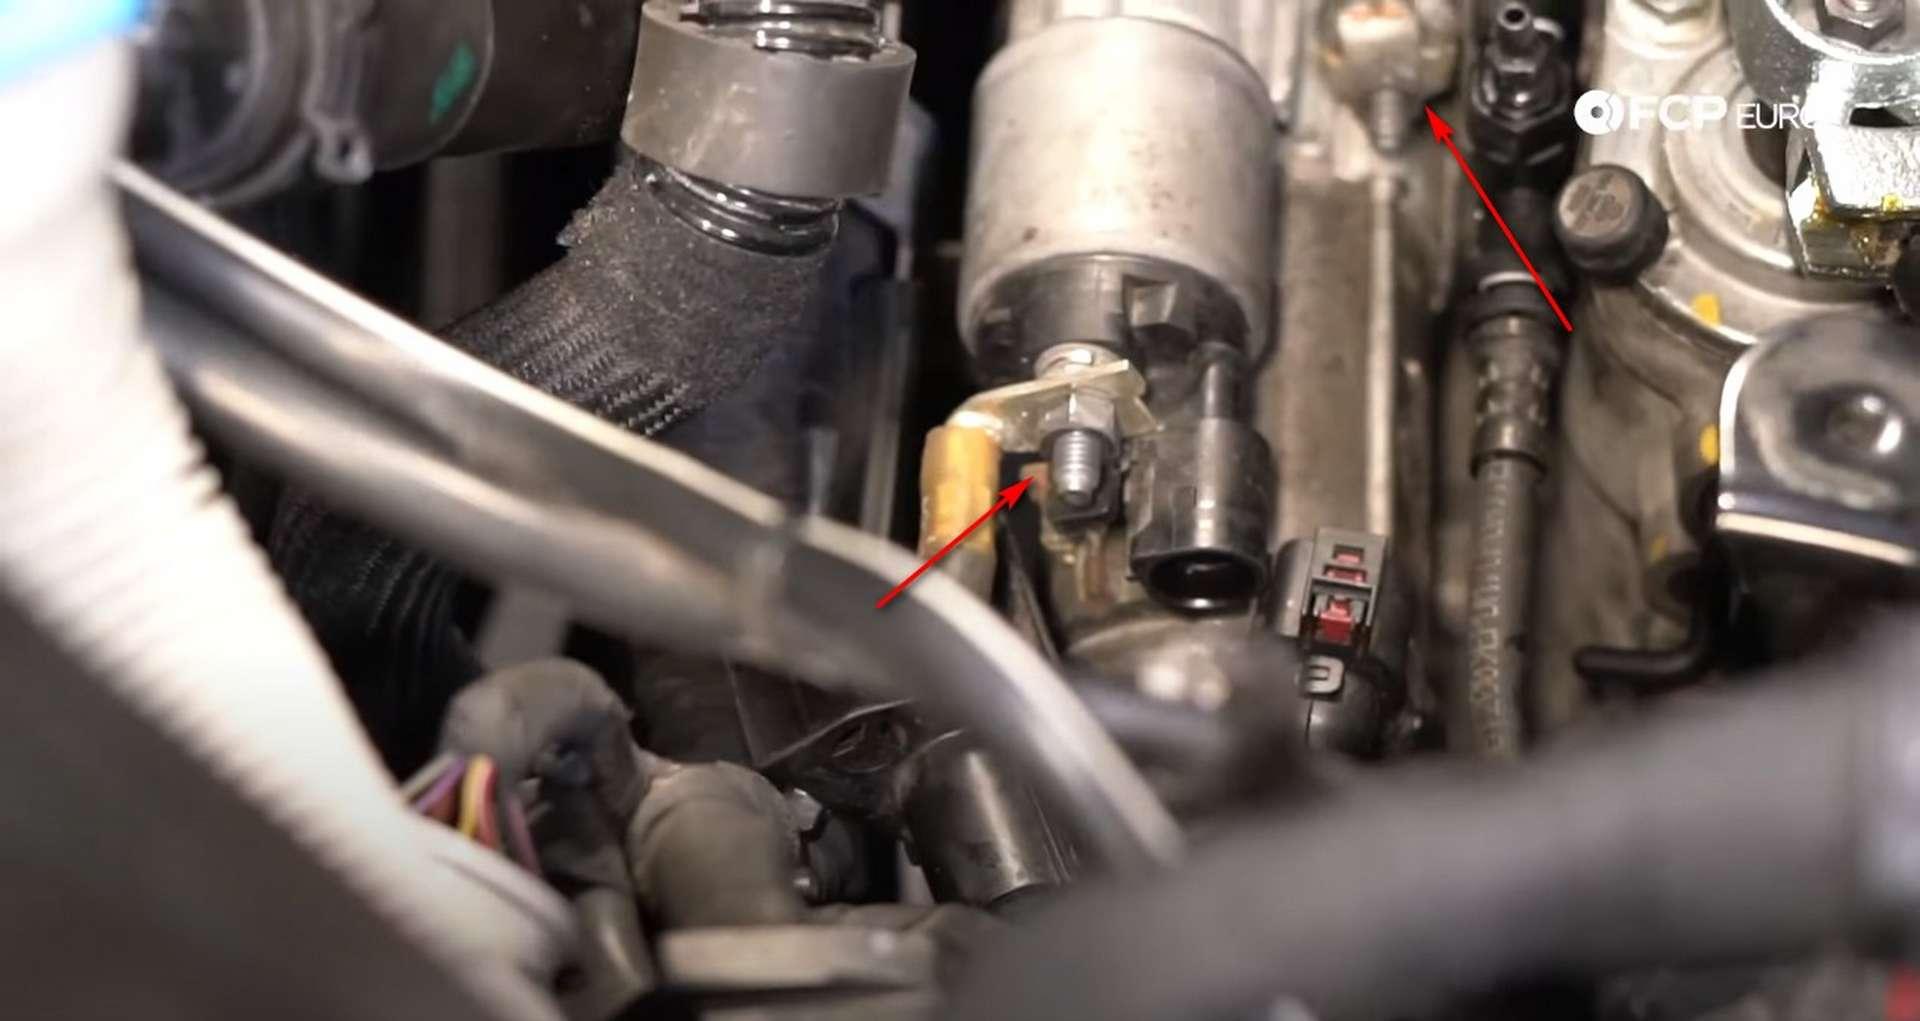 70-DIY_VW_GTI_Clutch-Job-Reinstalling-Buttoning-Engine-Bay